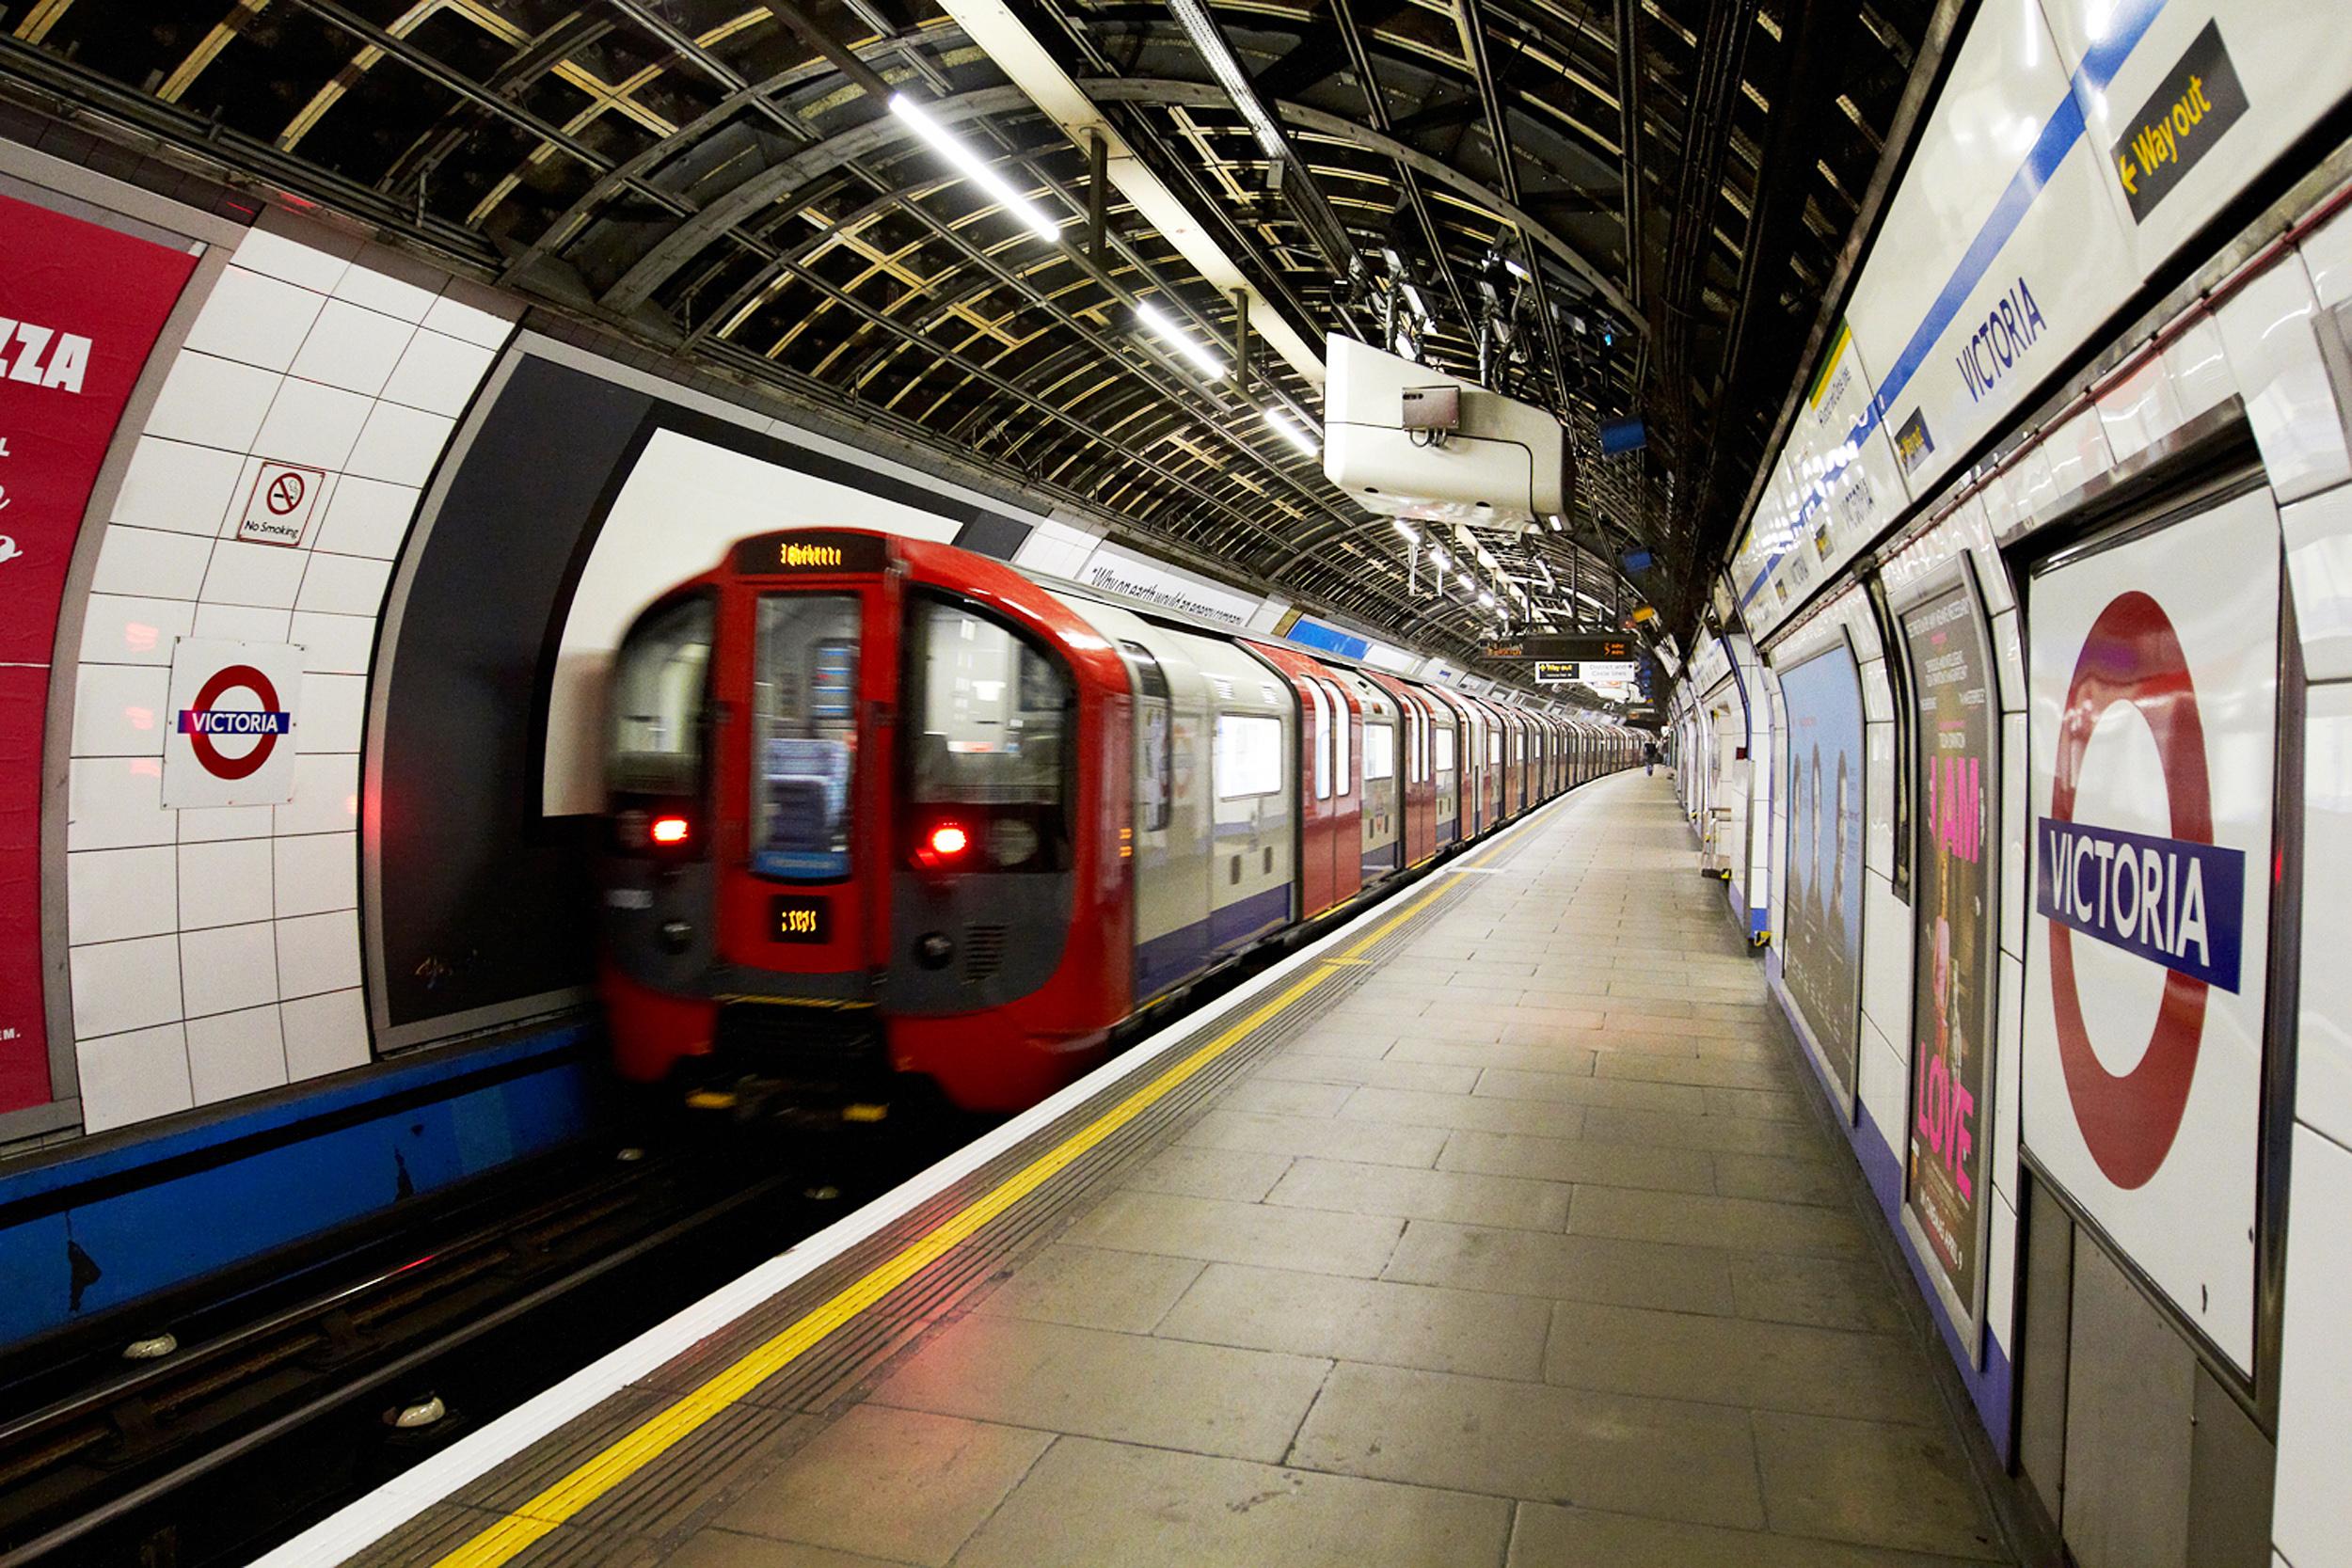 london underground wallpaper,transport,public transport,train station,metro station,rolling stock